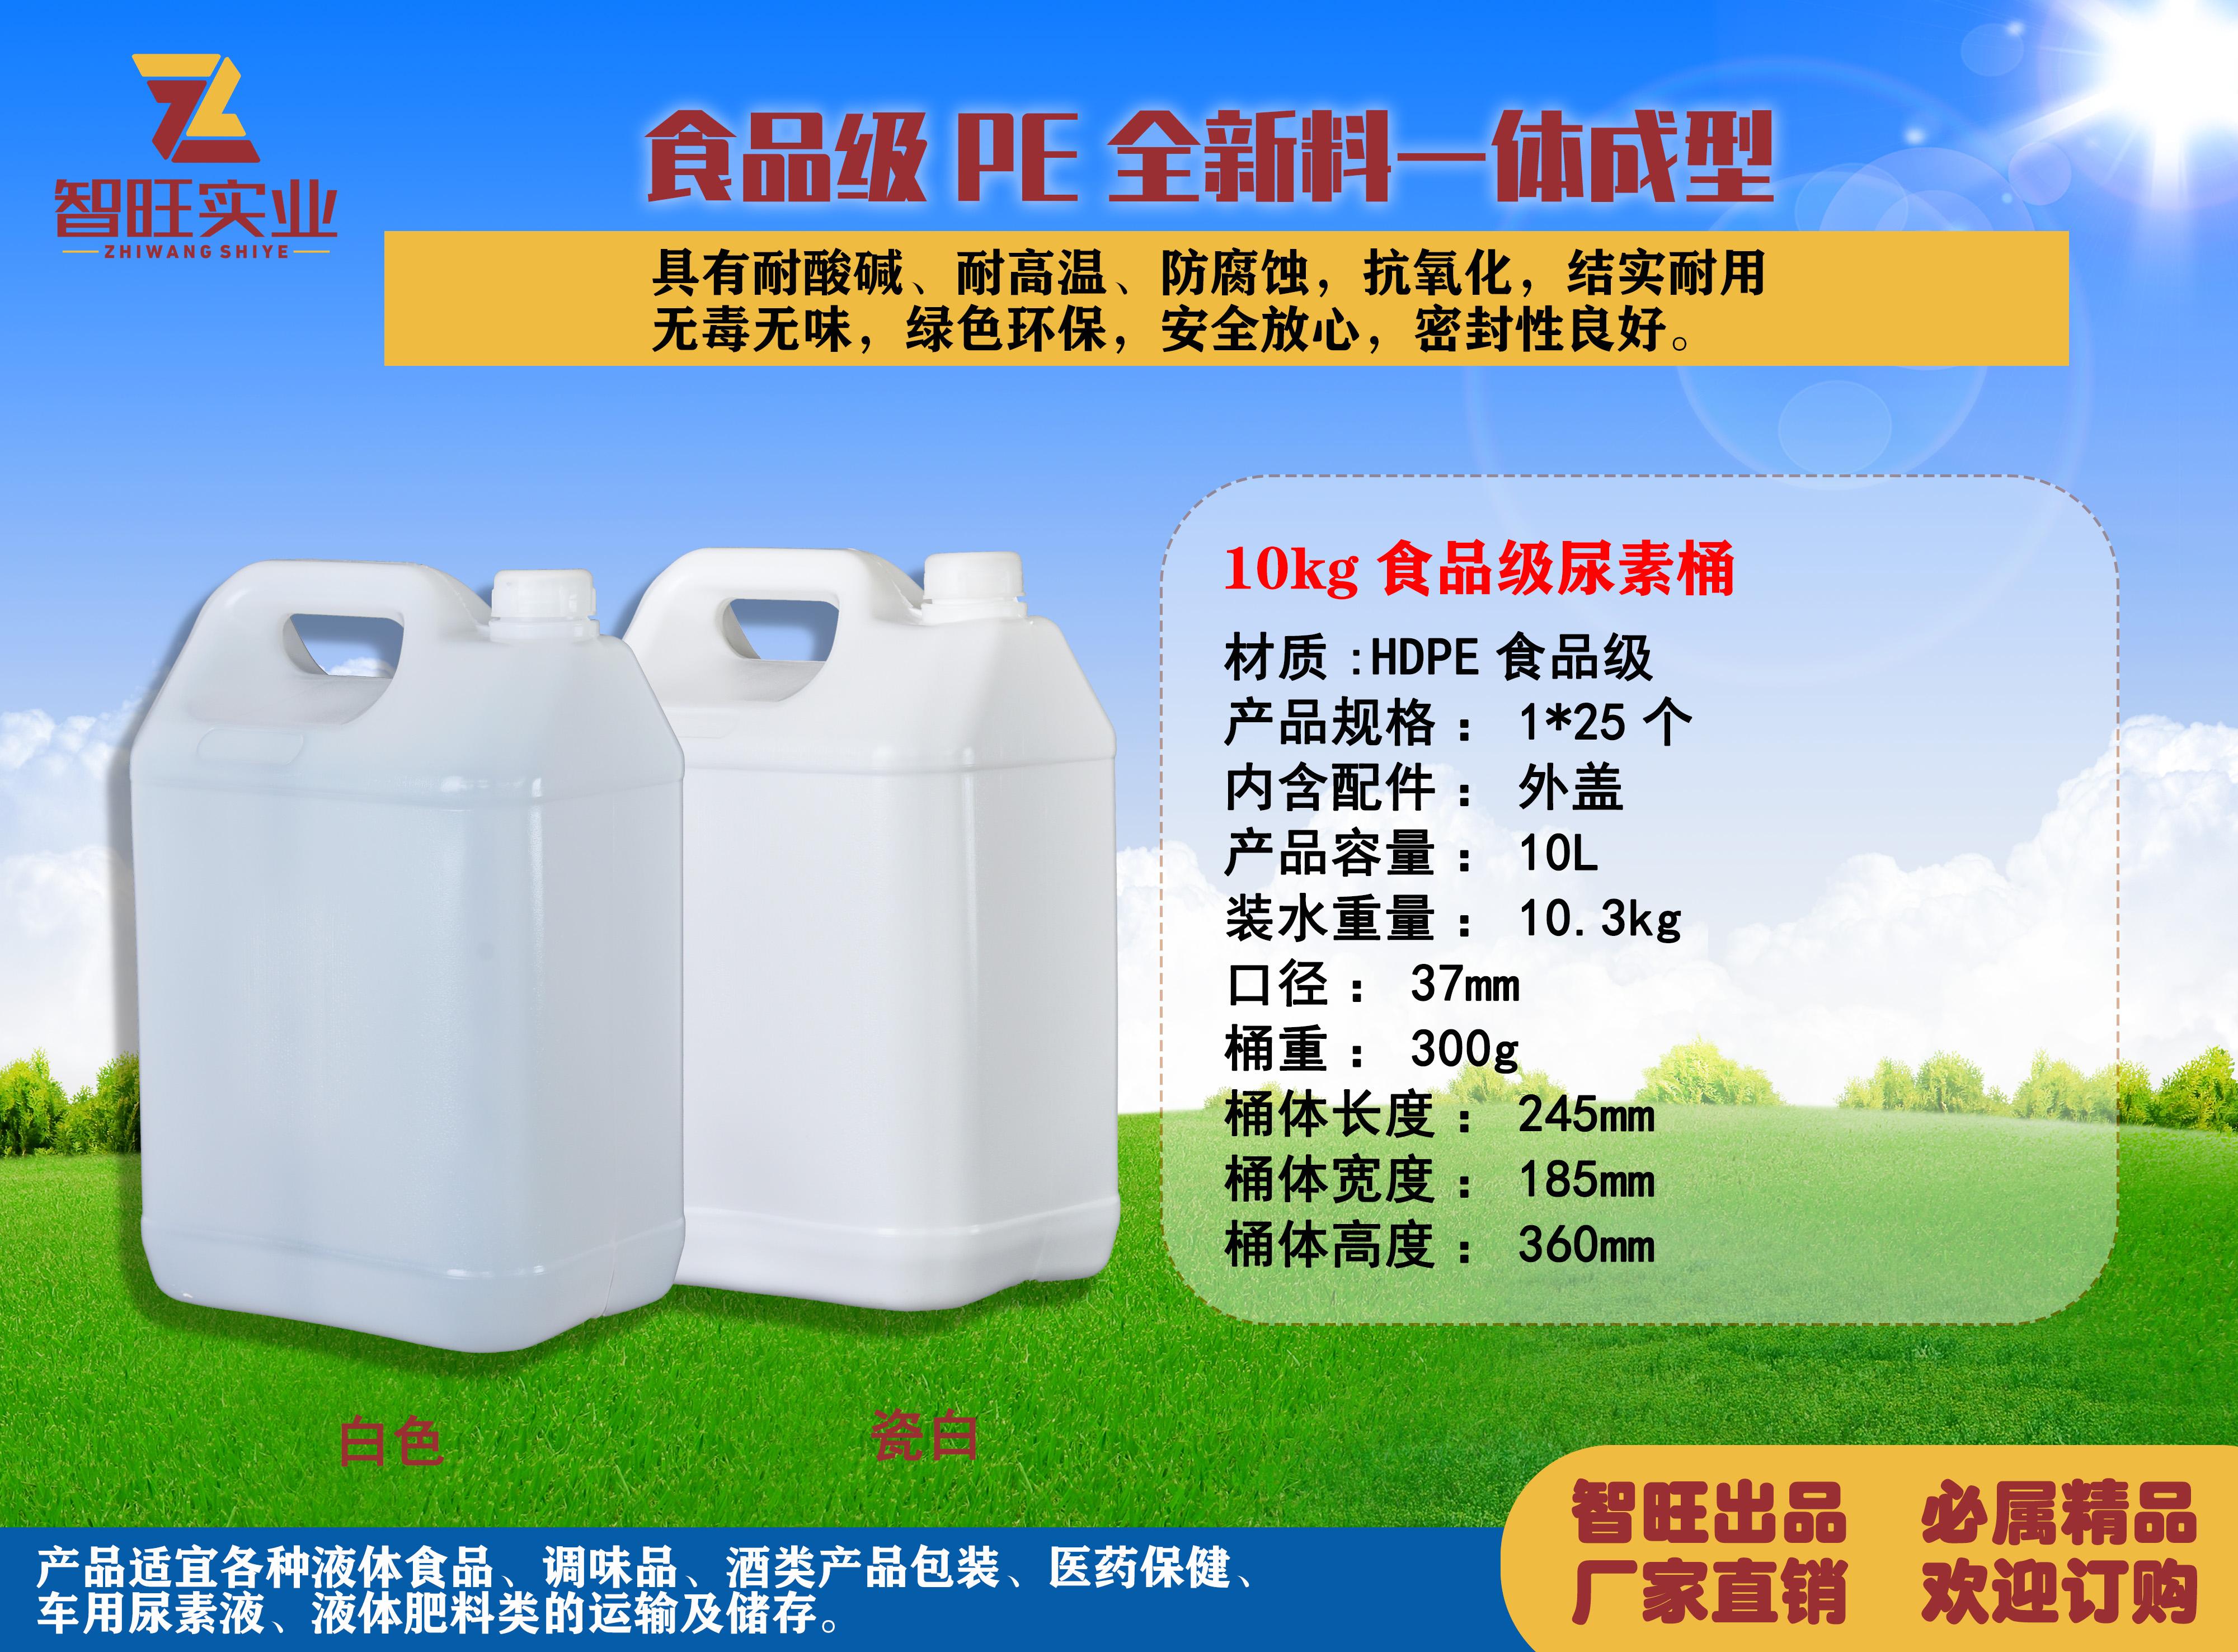 10kg食品級尿素桶